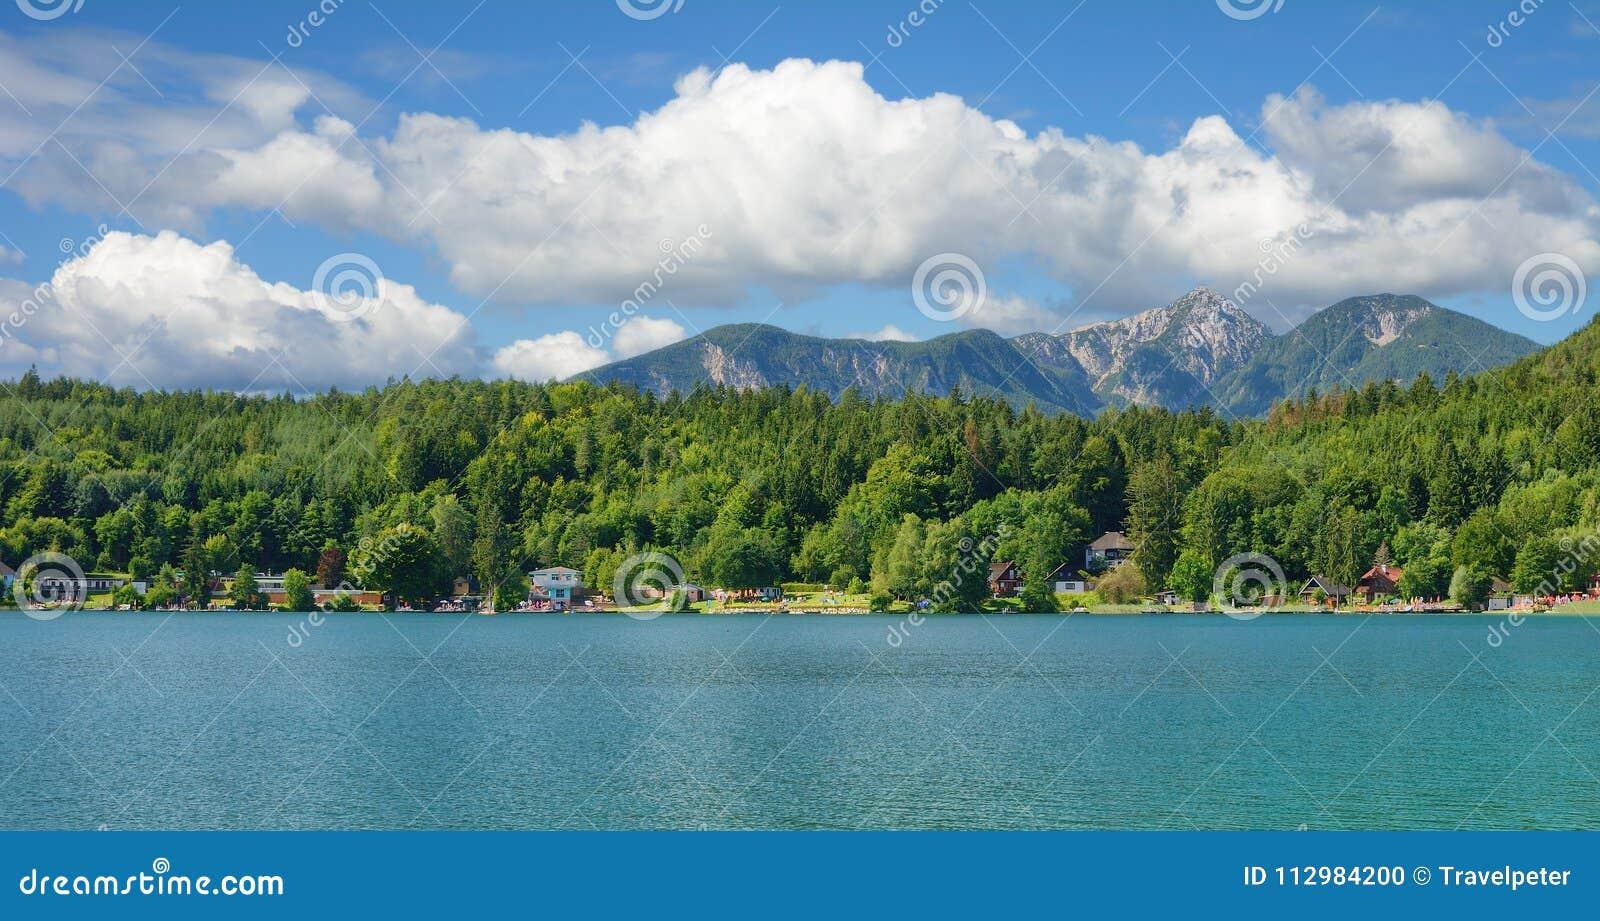 Lake Klopeiner See,Carinthia,Austria